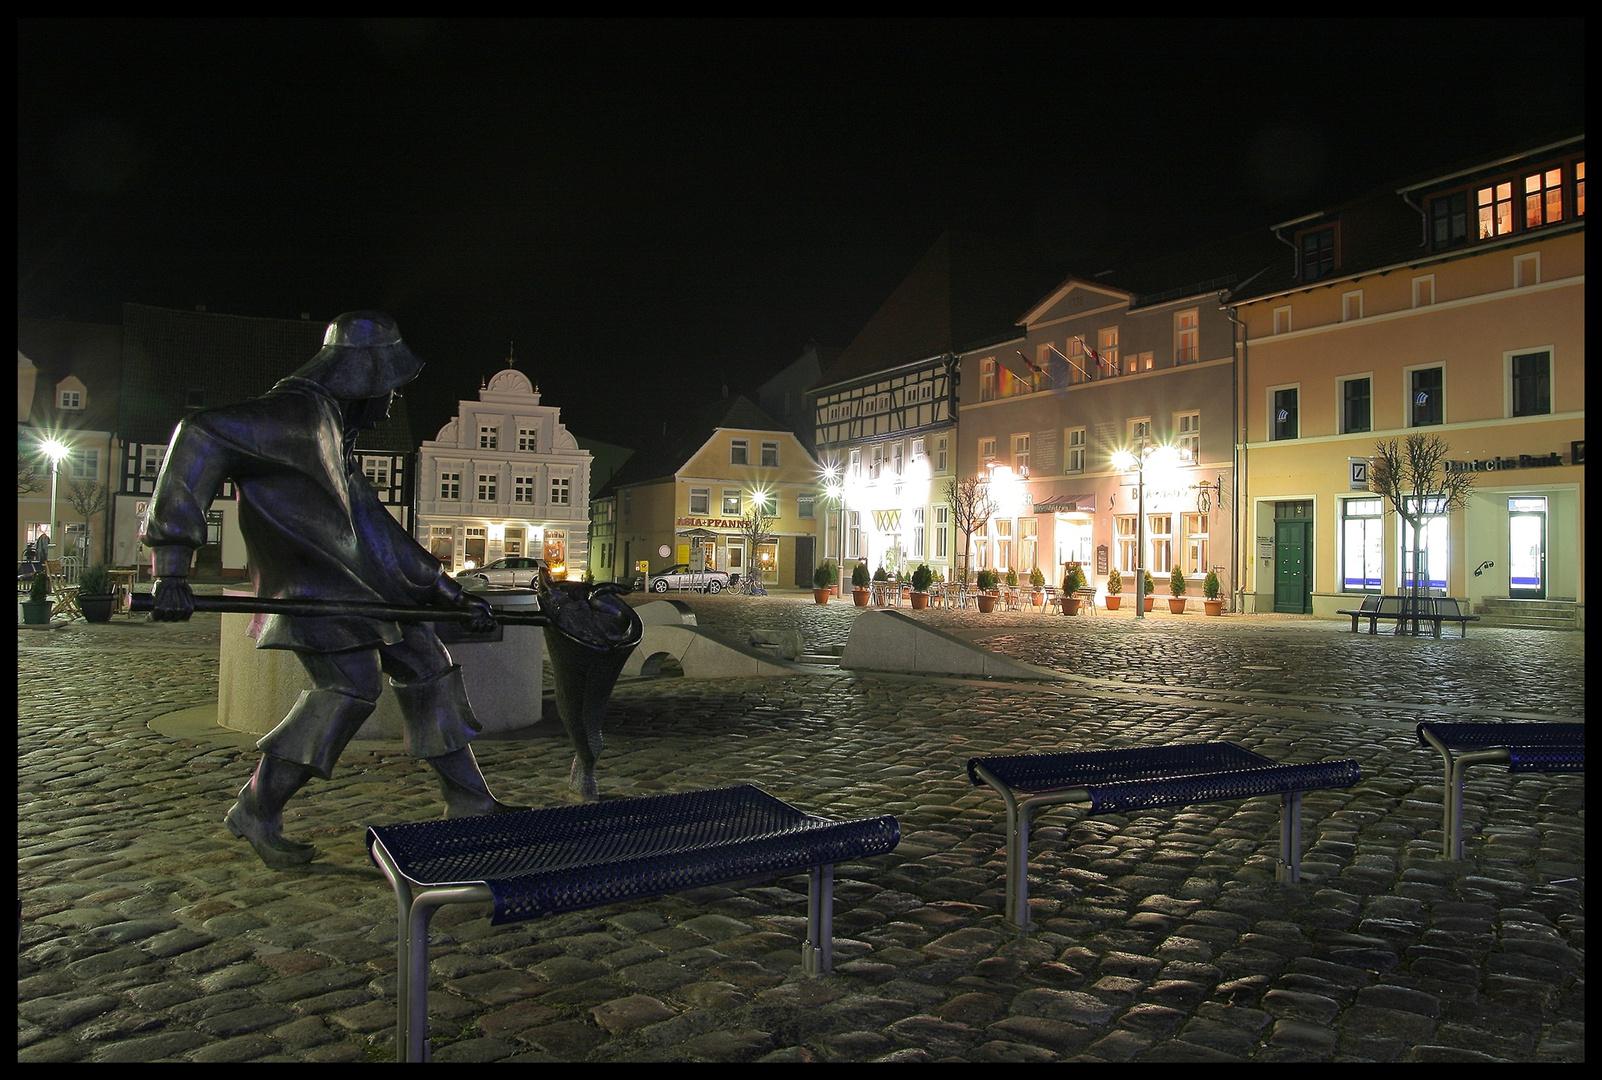 Ueckermünder Marktplatz